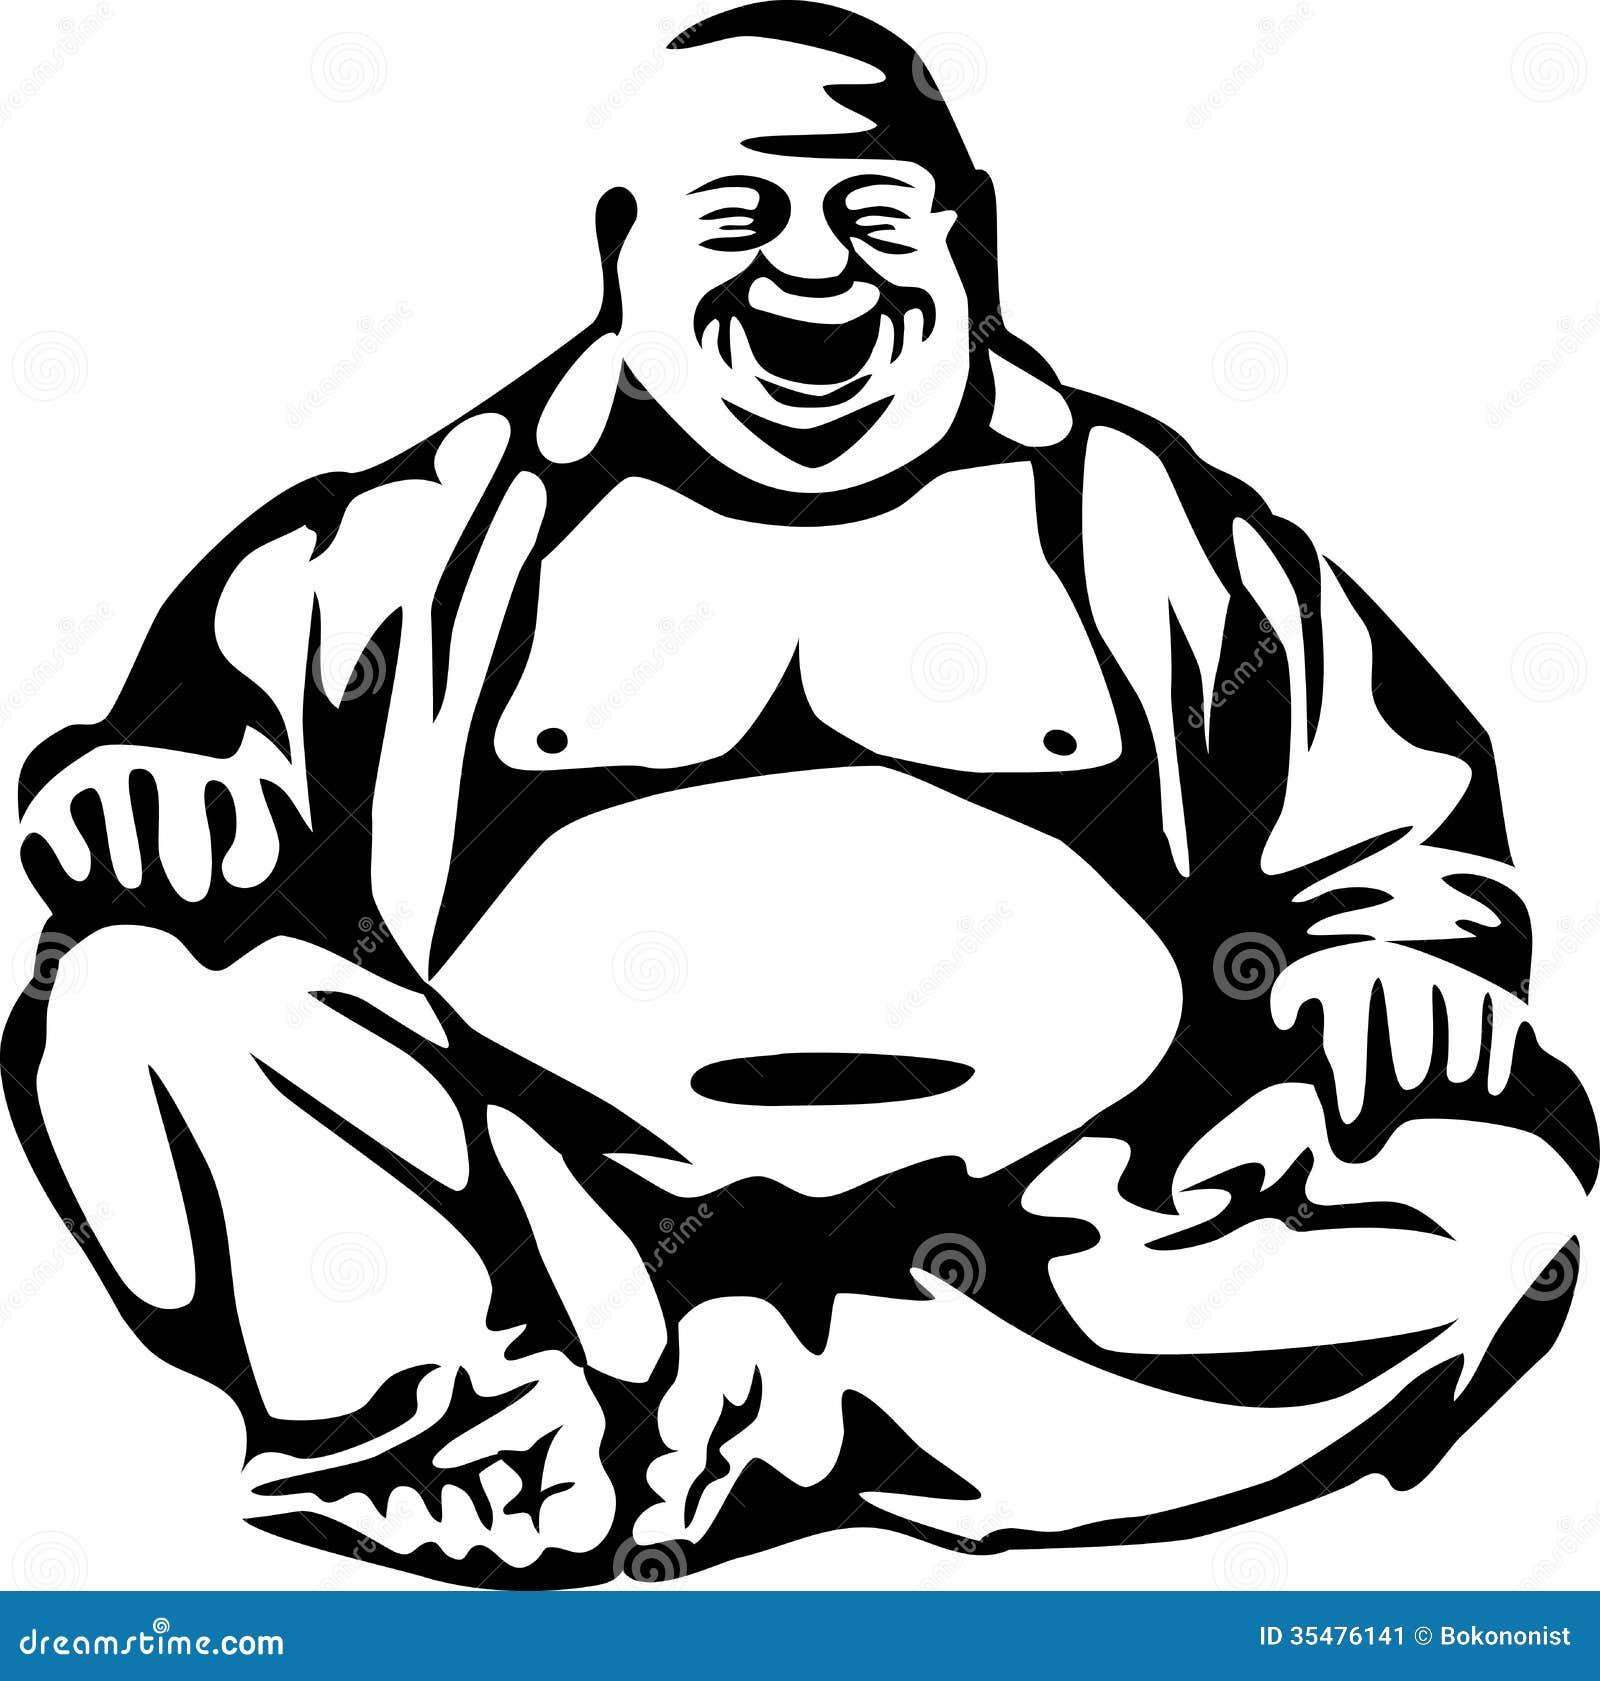 ¿A dónde vas, amigo, con tu secreto? los que se pelean se.... Buddha-stylized-laughing-black-white-illustration-35476141